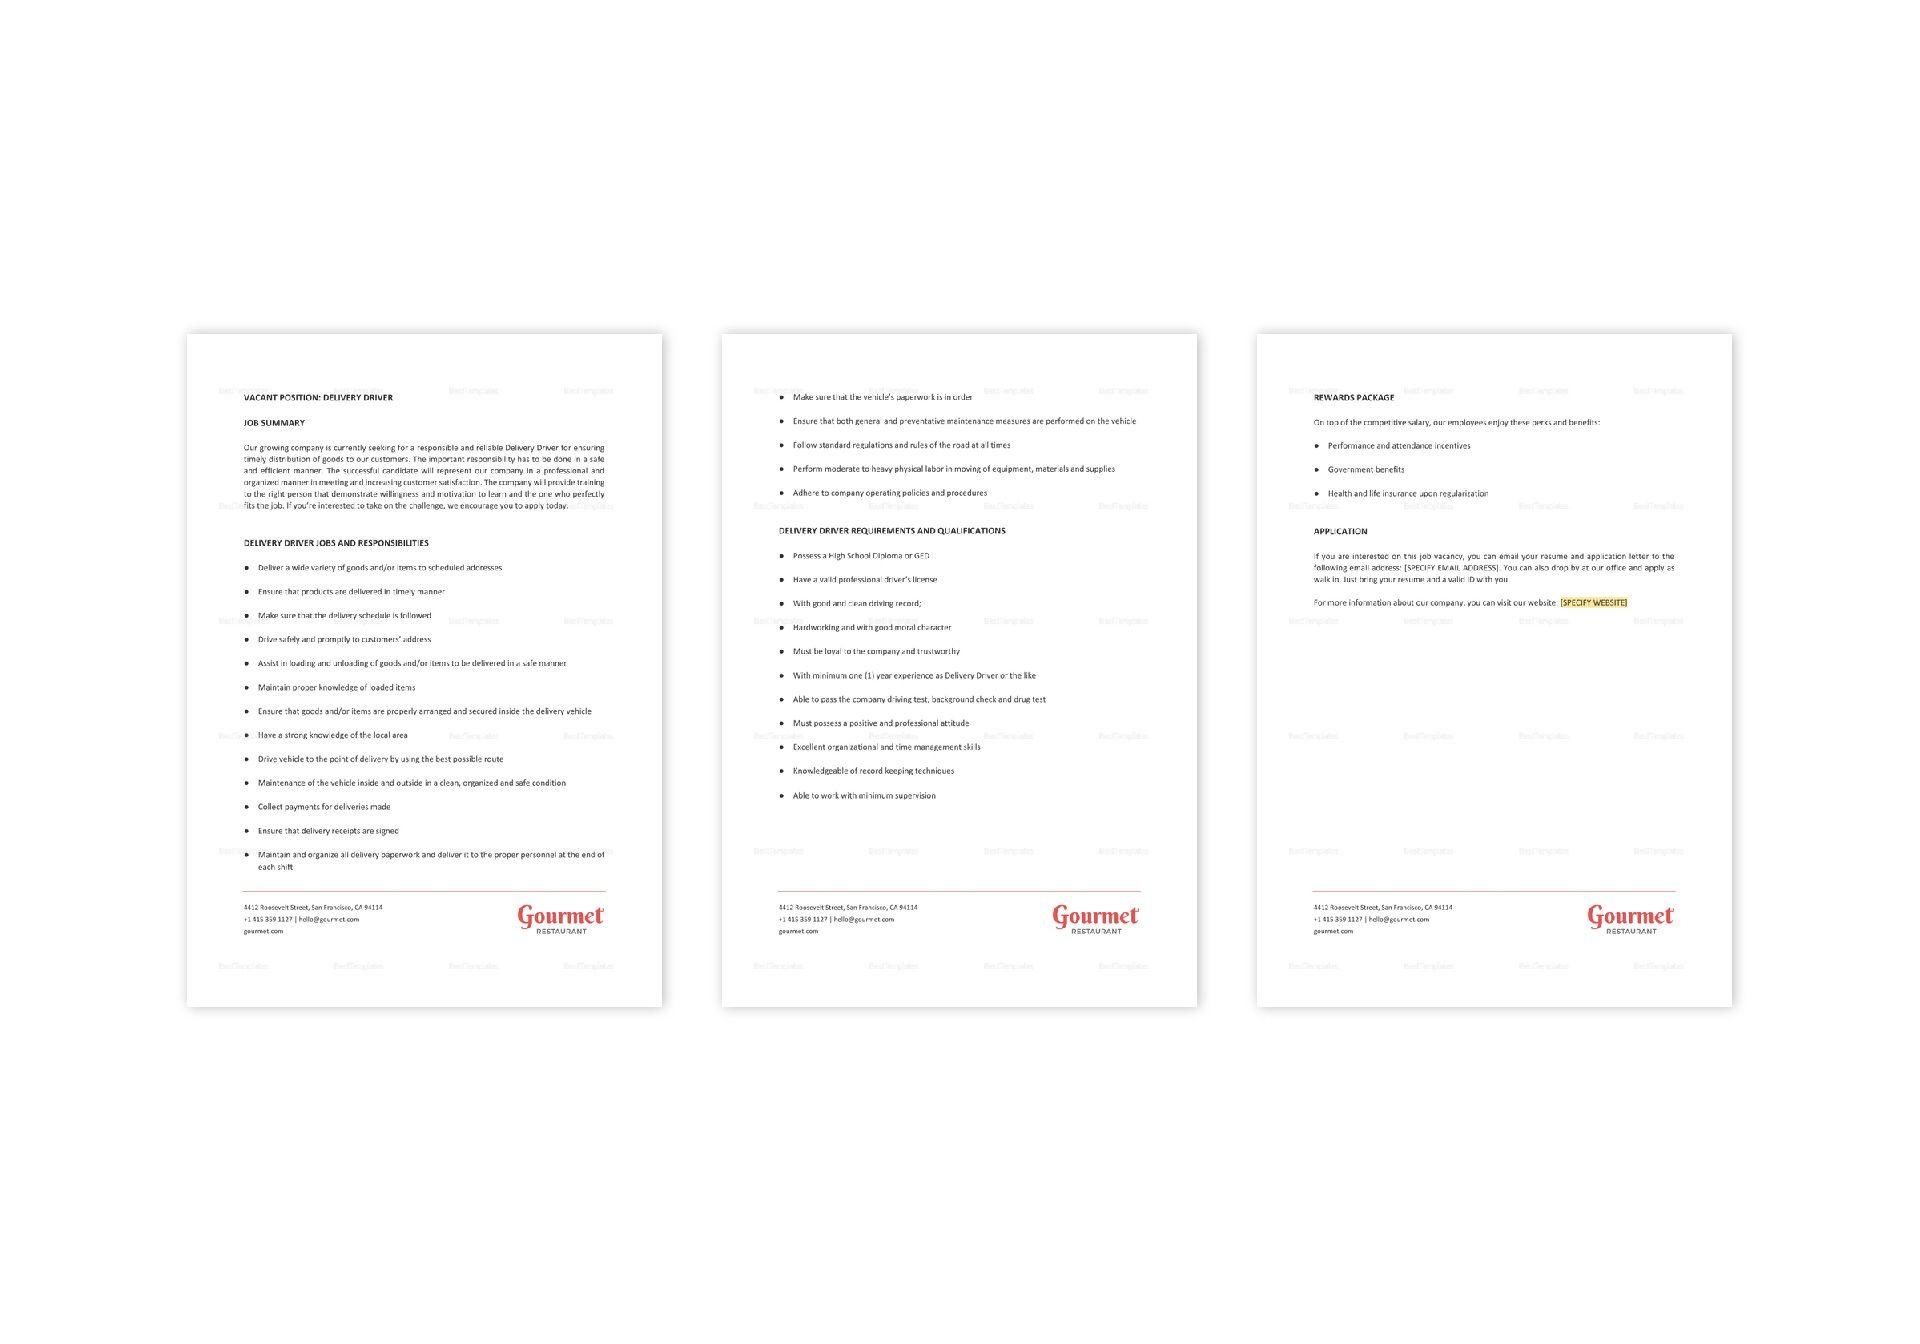 Restaurant Delivery Driver Job Description Template in